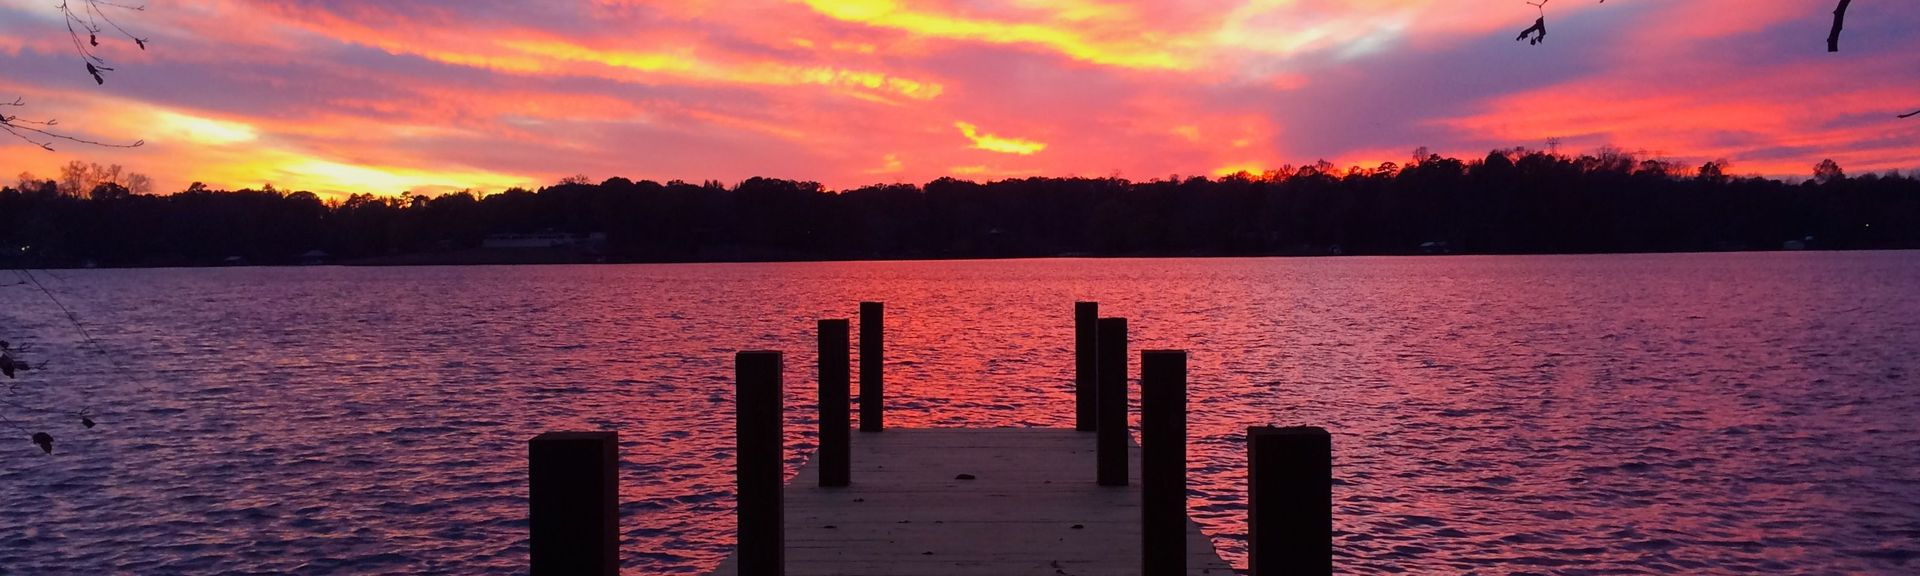 Mecklenburg County, North Carolina, United States of America